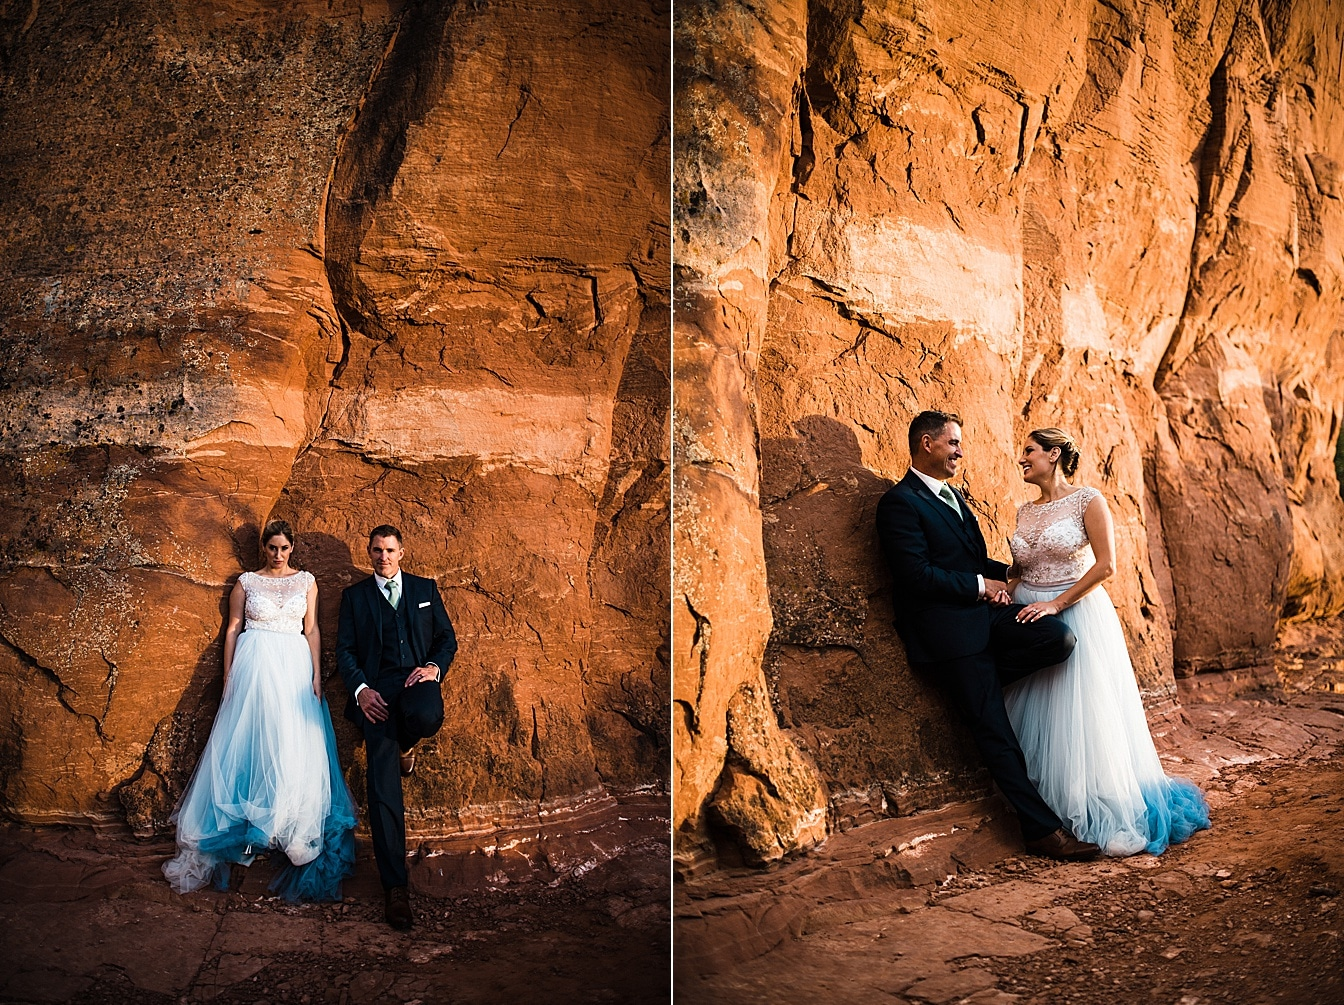 Colorado-Mountain-Elopement-Meredith-Humayun_0069.jpg